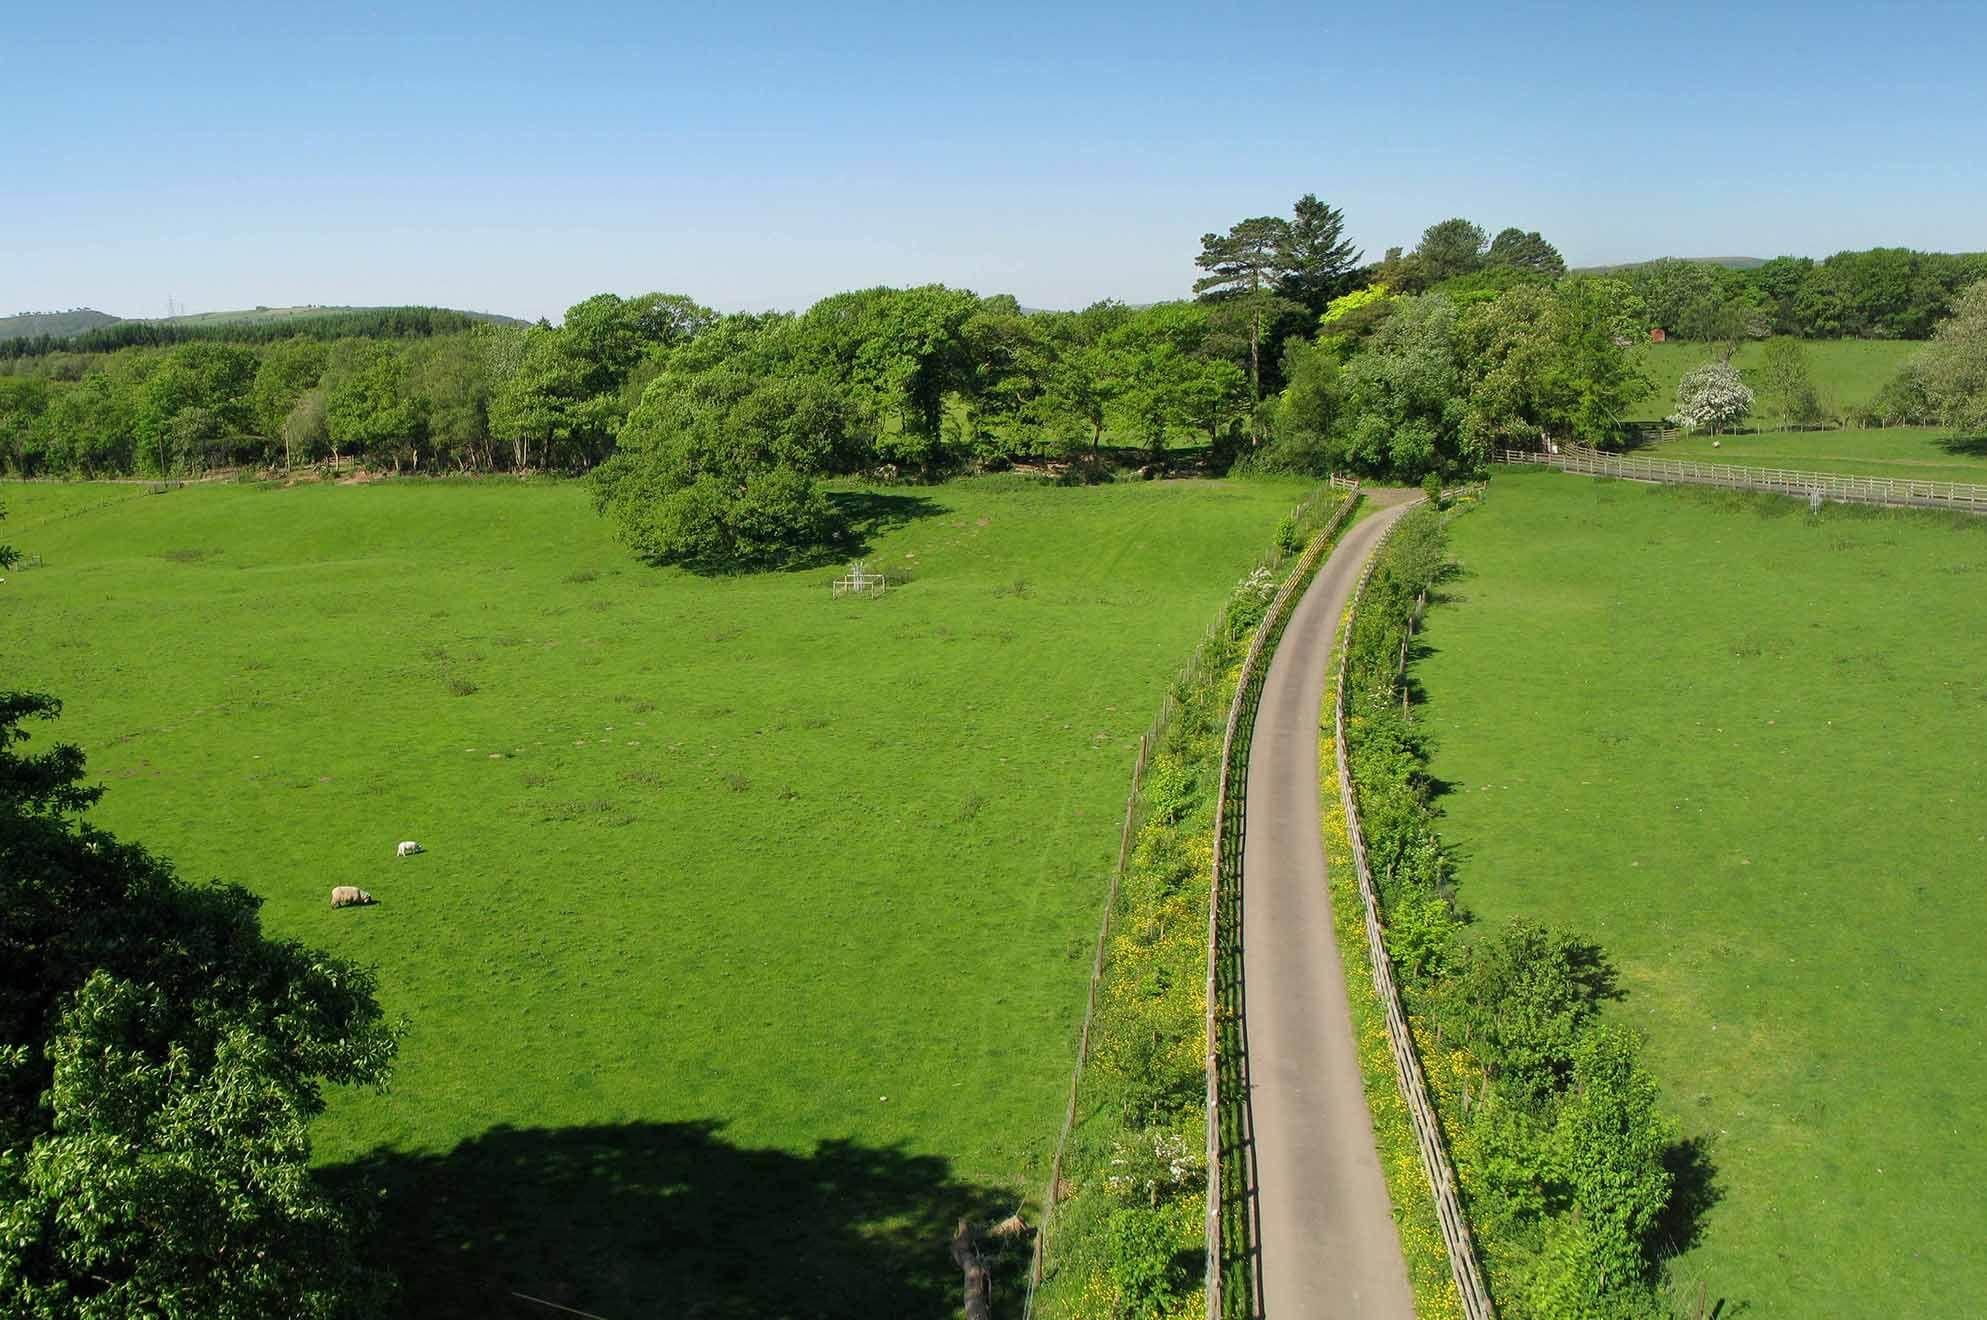 Approach driveway through parkland